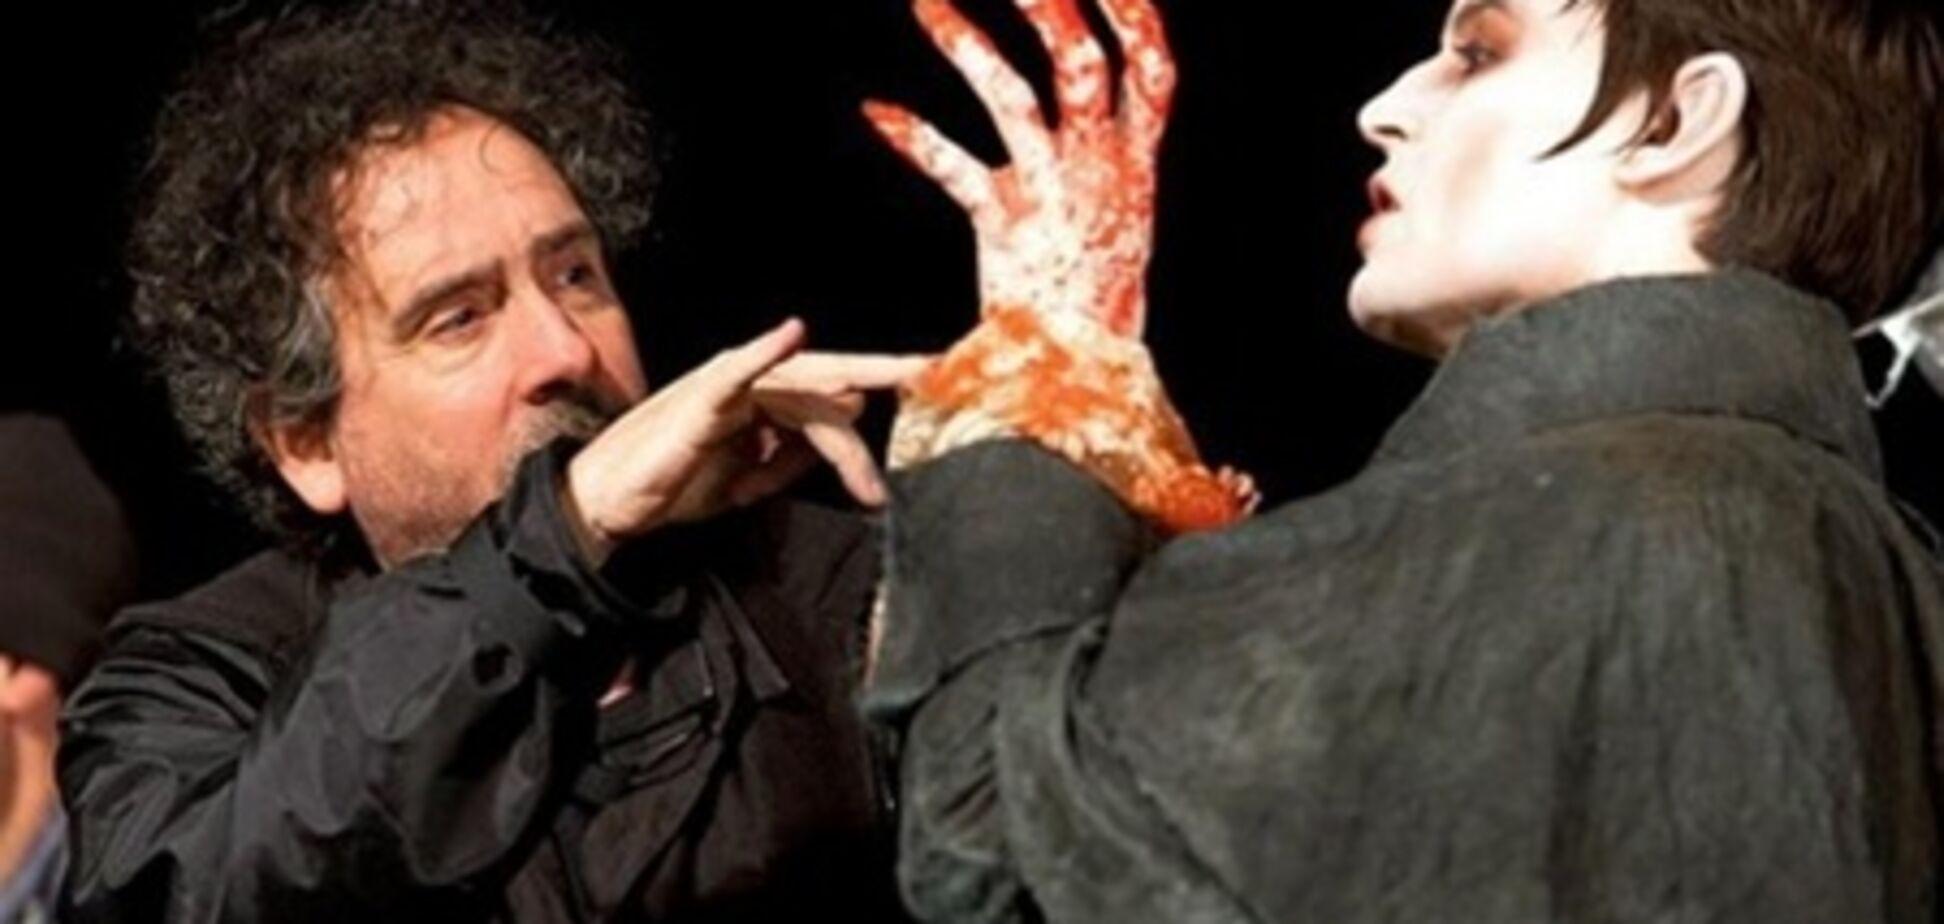 «Мрачные тени»: оторванный палец Джонни Деппа